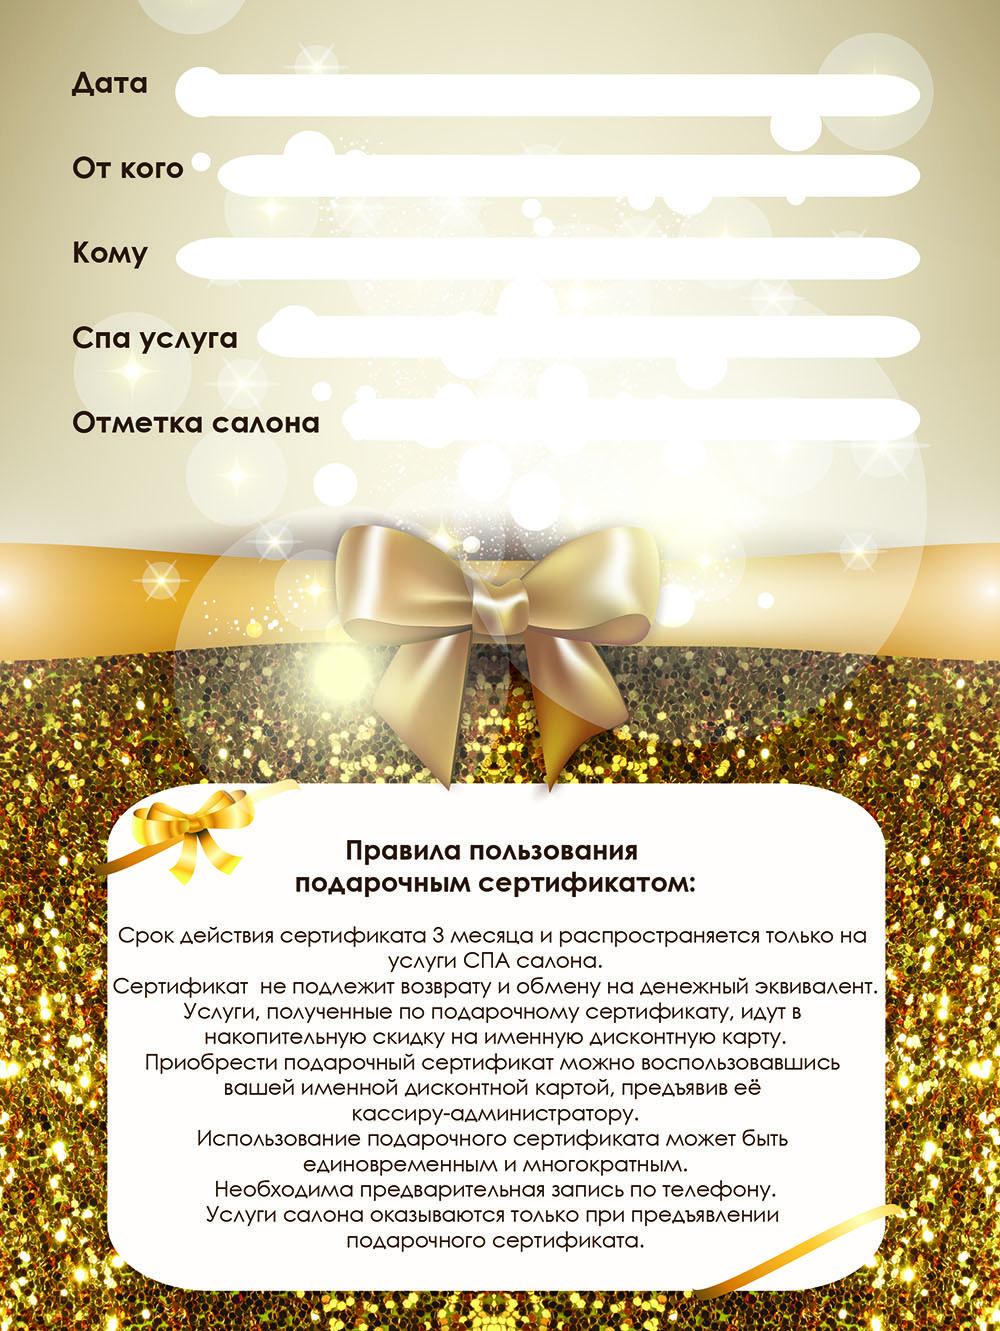 Corporate designs, artkatana - kateryna fedorova kiev, дизайн баннер салон красоты закзать киев москва banner design